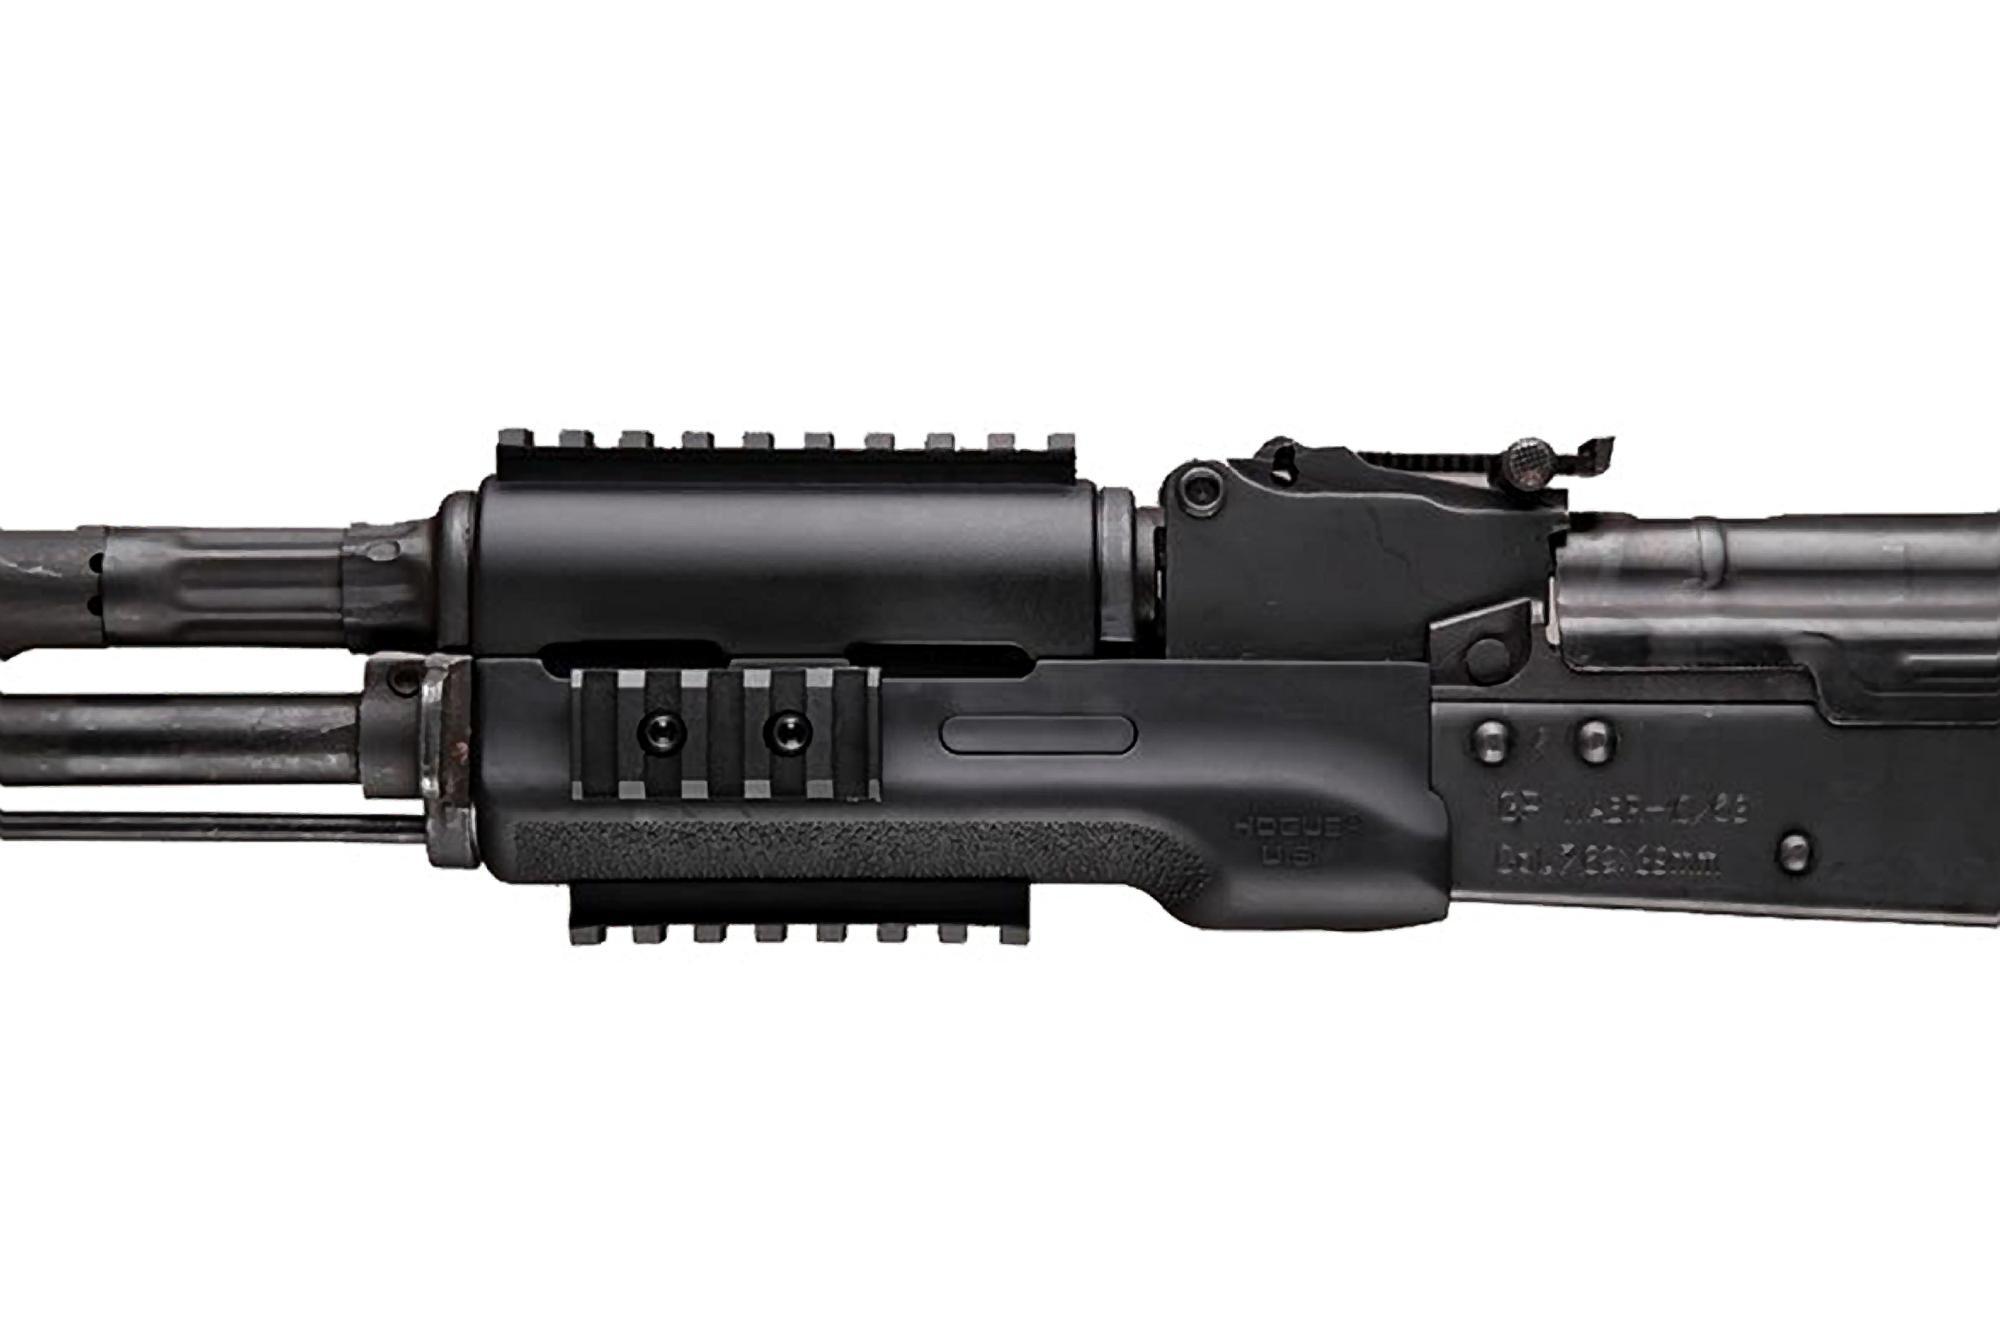 Hogue AK-47/AK-74 Standard OverMolded Kit - Chinese / Russian Stamped AKs